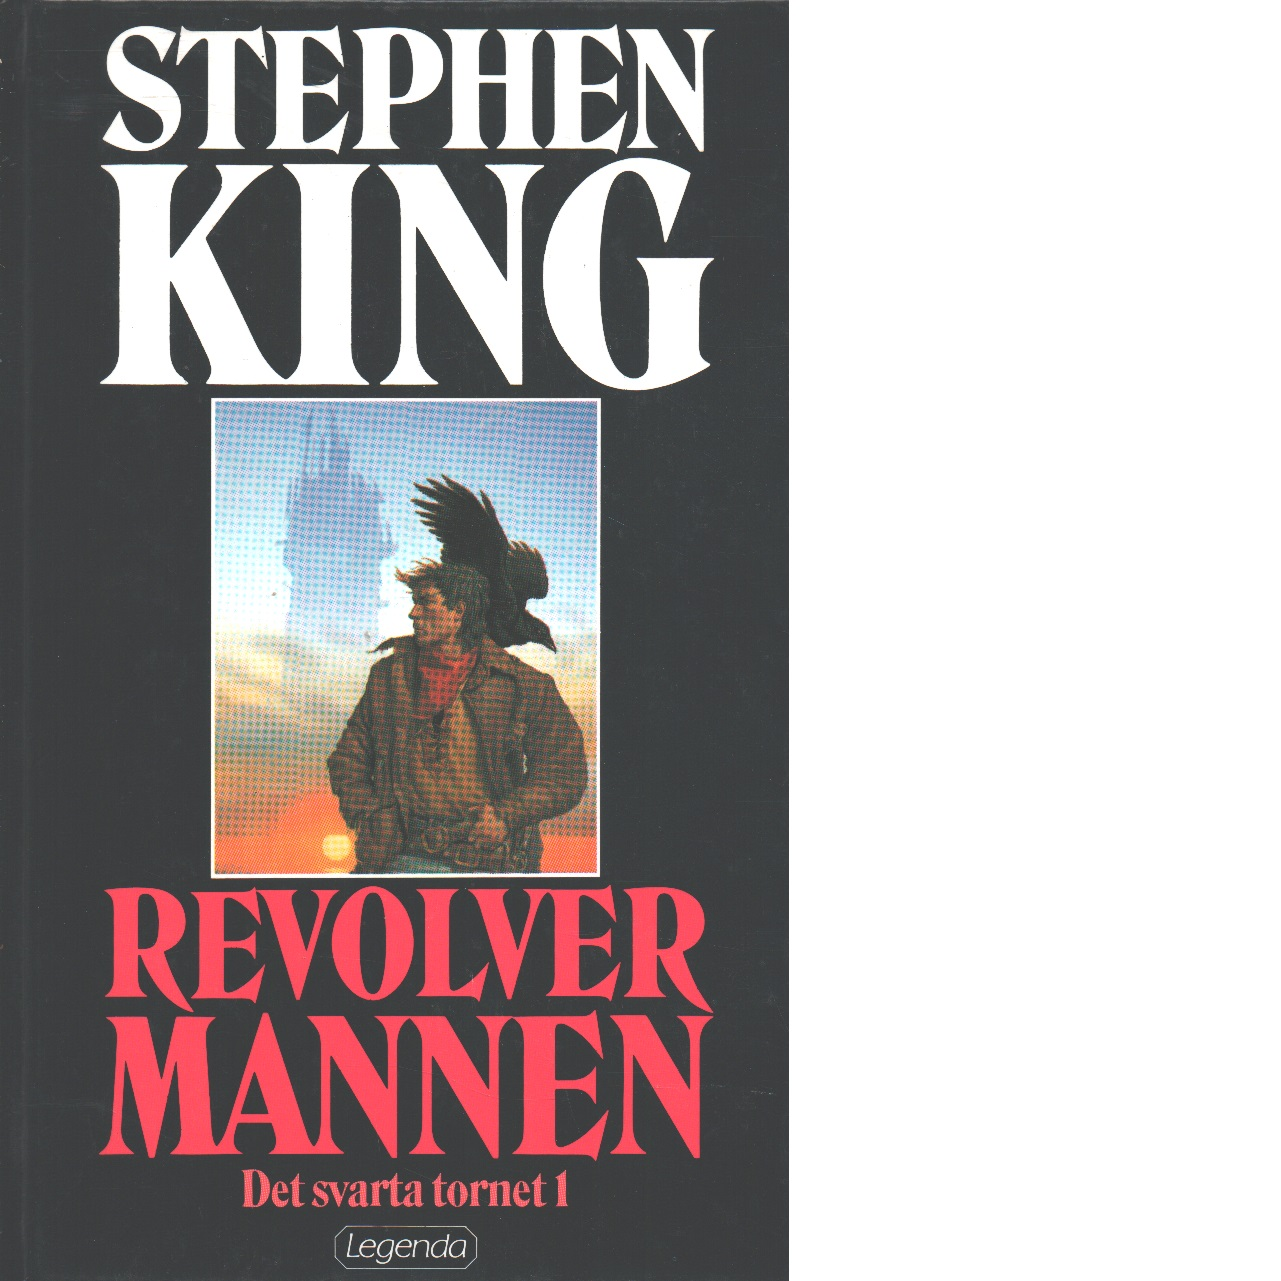 Det svarta tornet. 1, Revolvermannen - King, Stephen